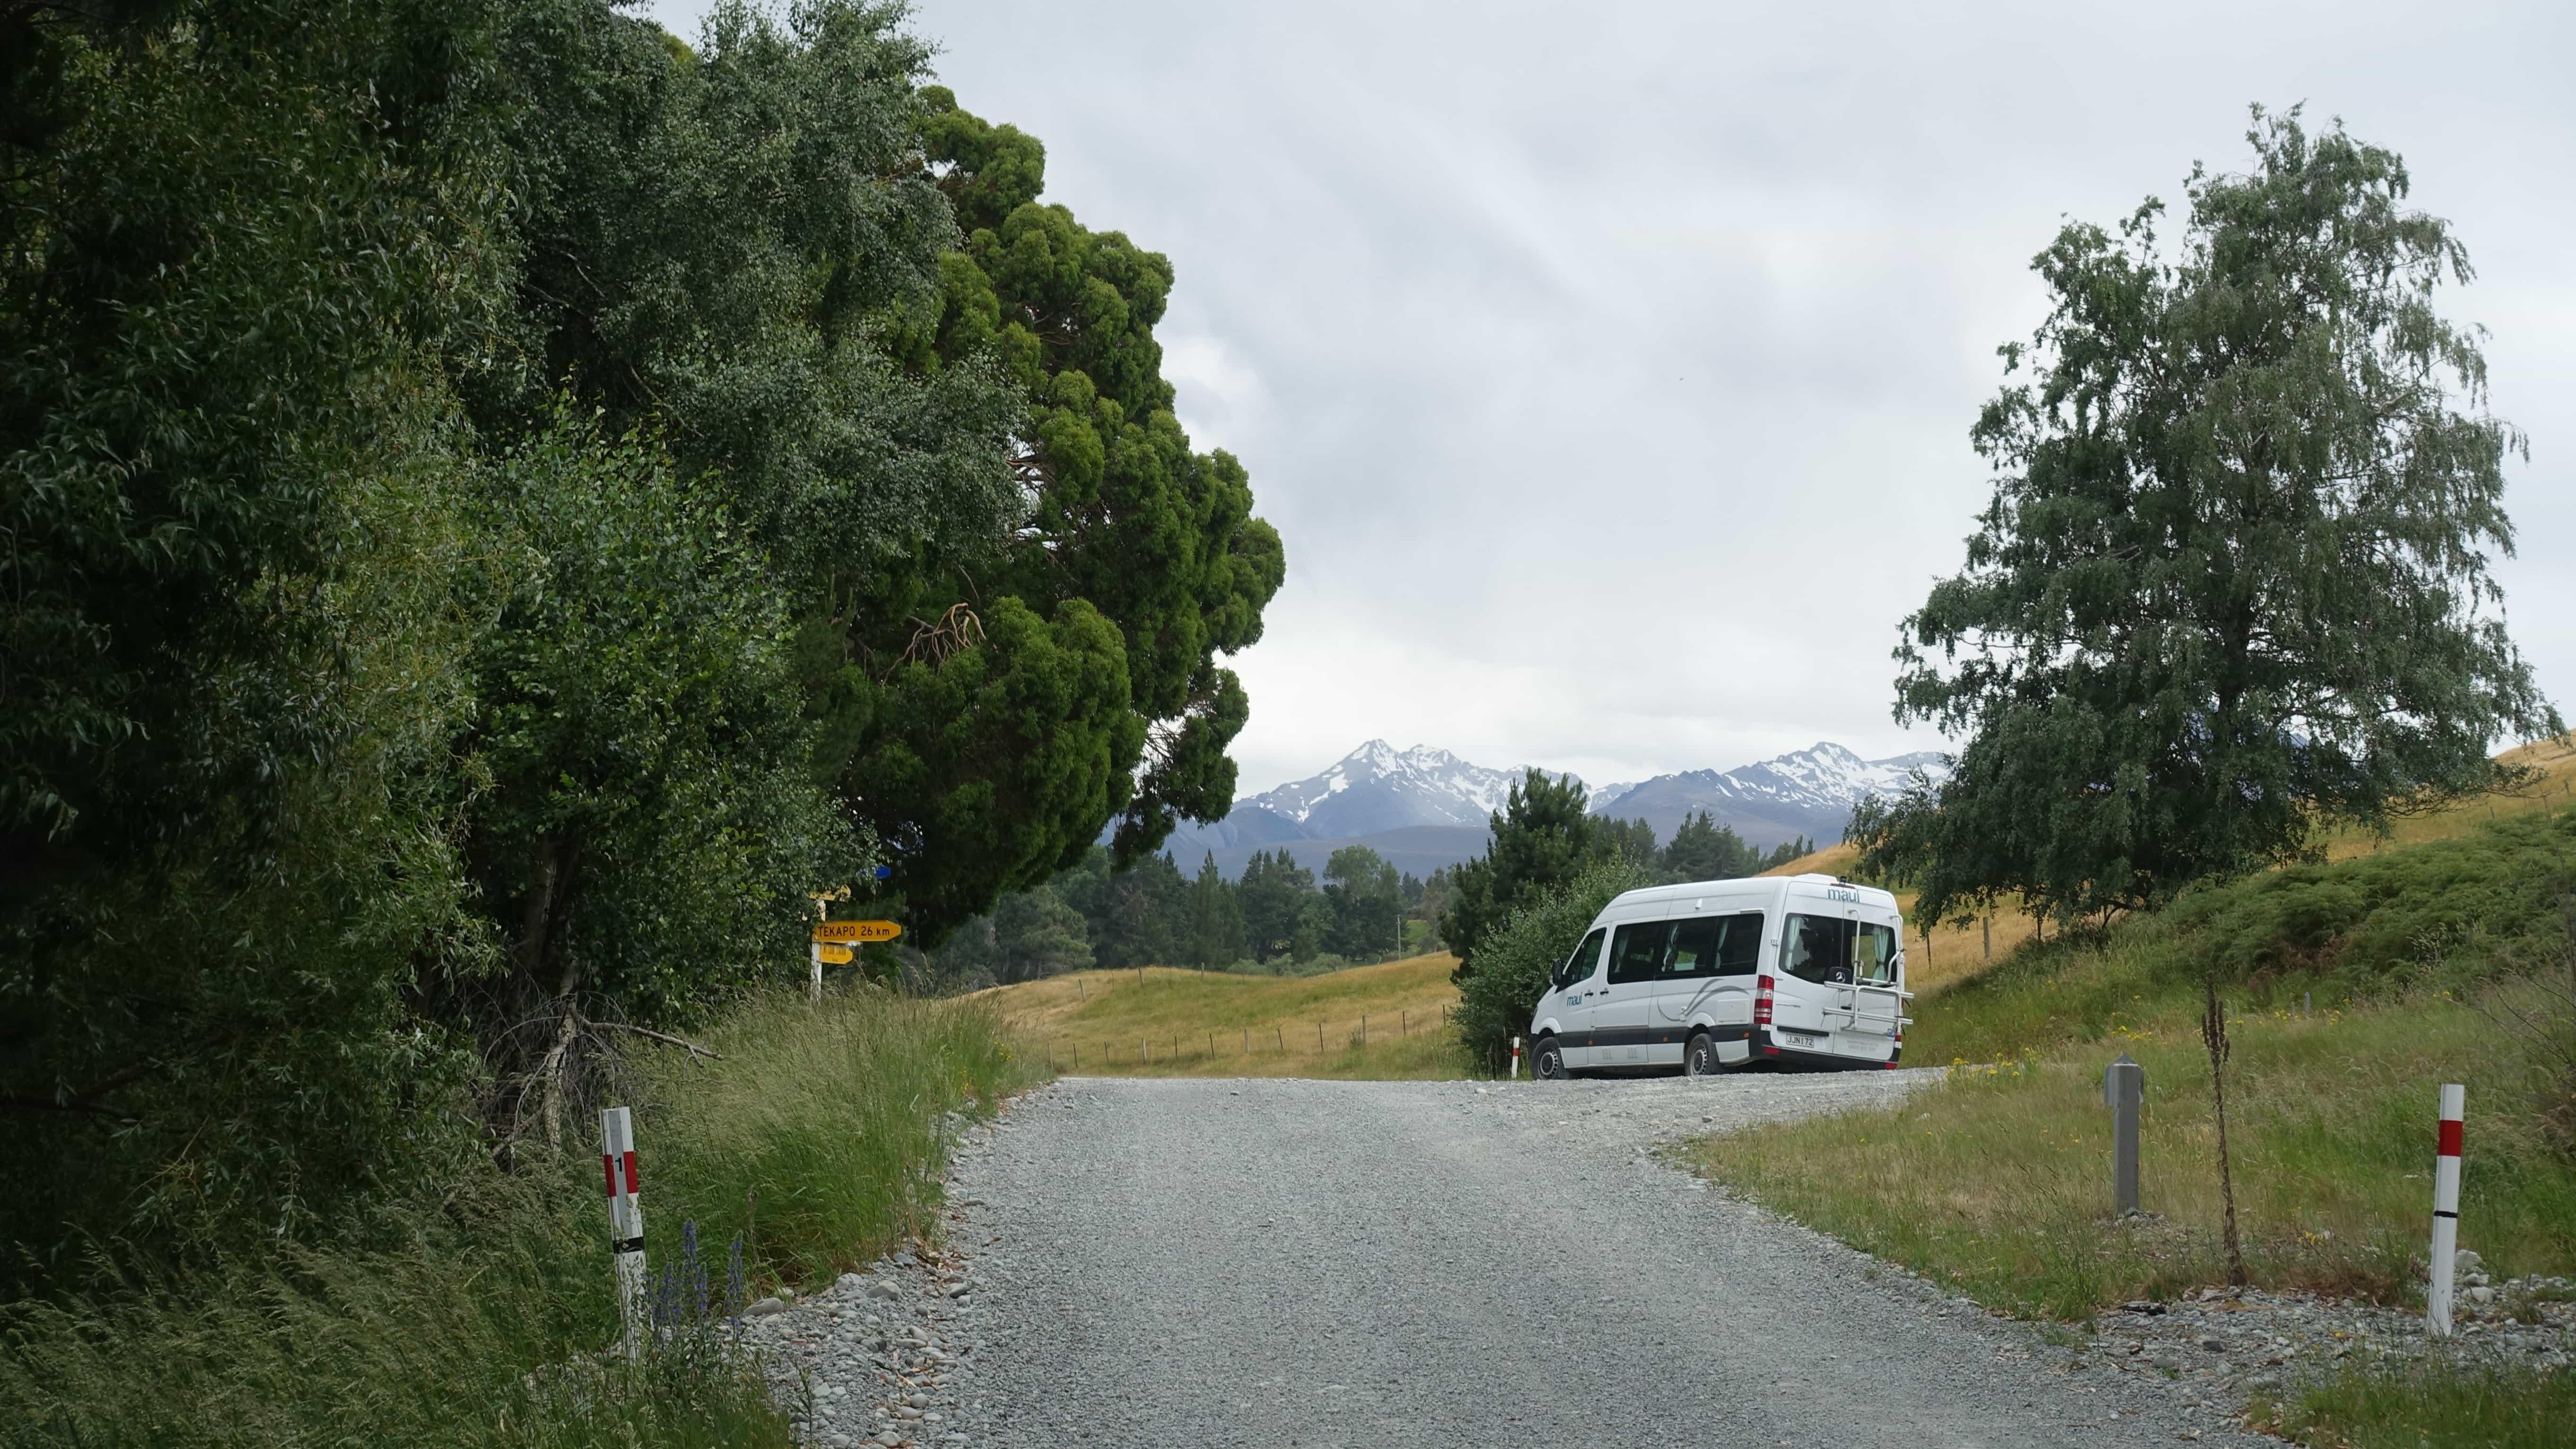 Der Maui Camper in Neuseeland an der Abzweigung nach Tekapo